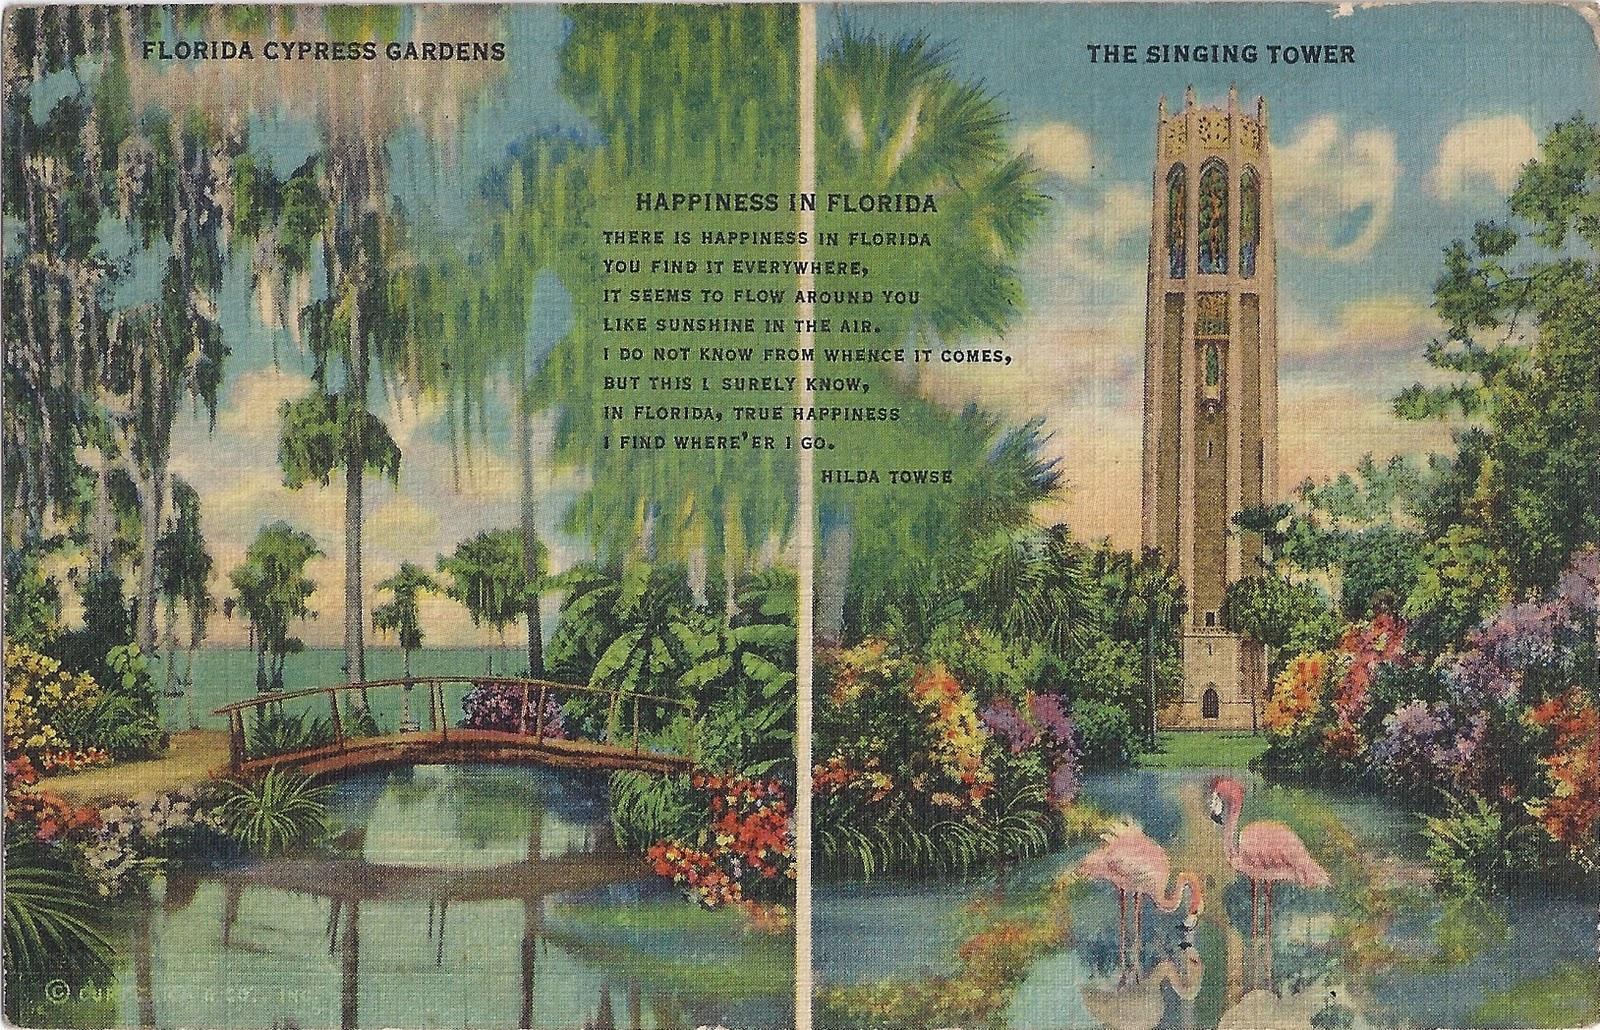 Leaping Frog Designs Free Vintage Image Florida Cypress